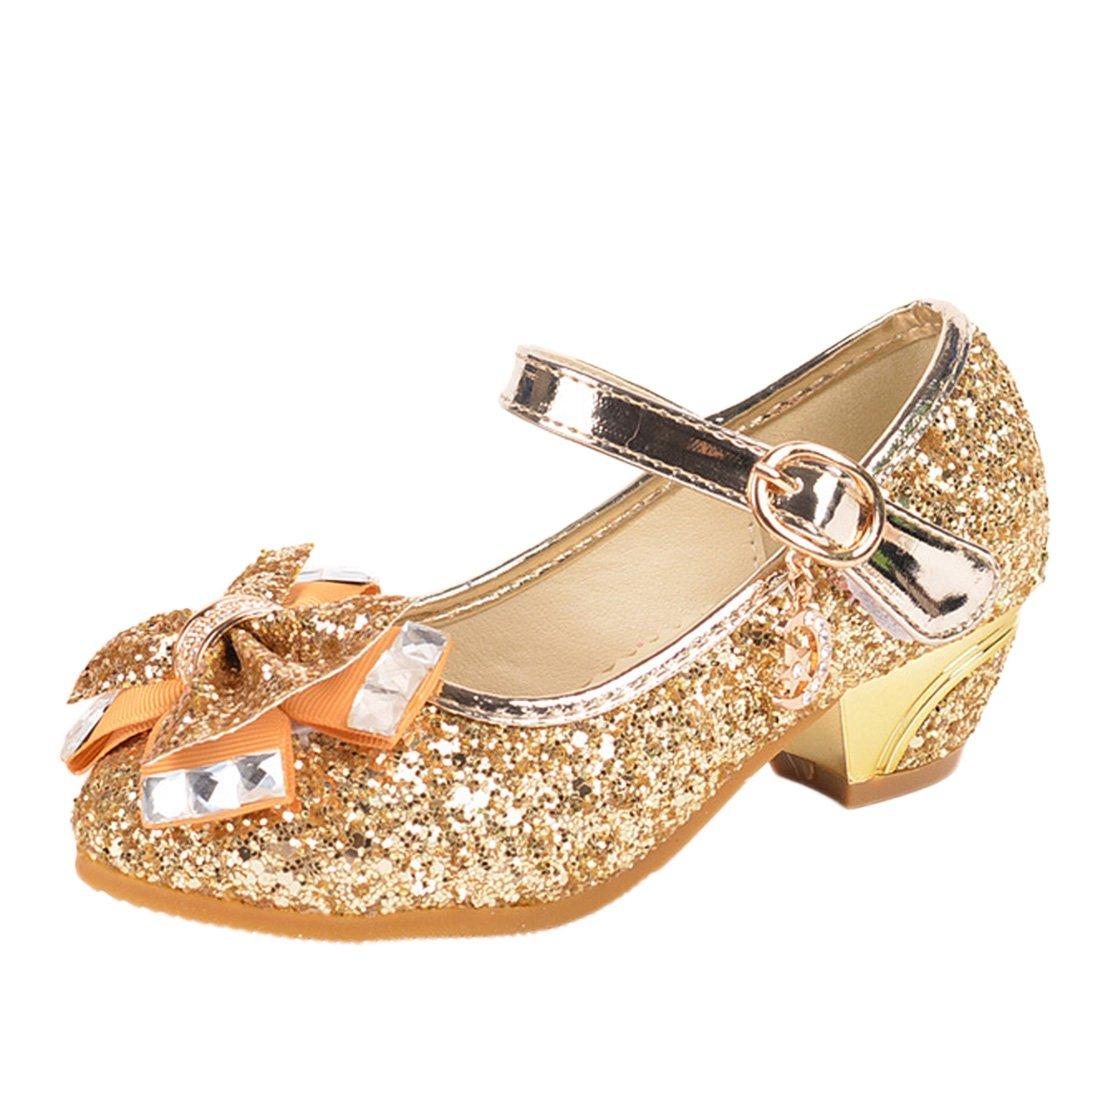 Girls Cosplay Dress up Wedding Party Bridesmaids Heel Mary Jane Princess Shoes